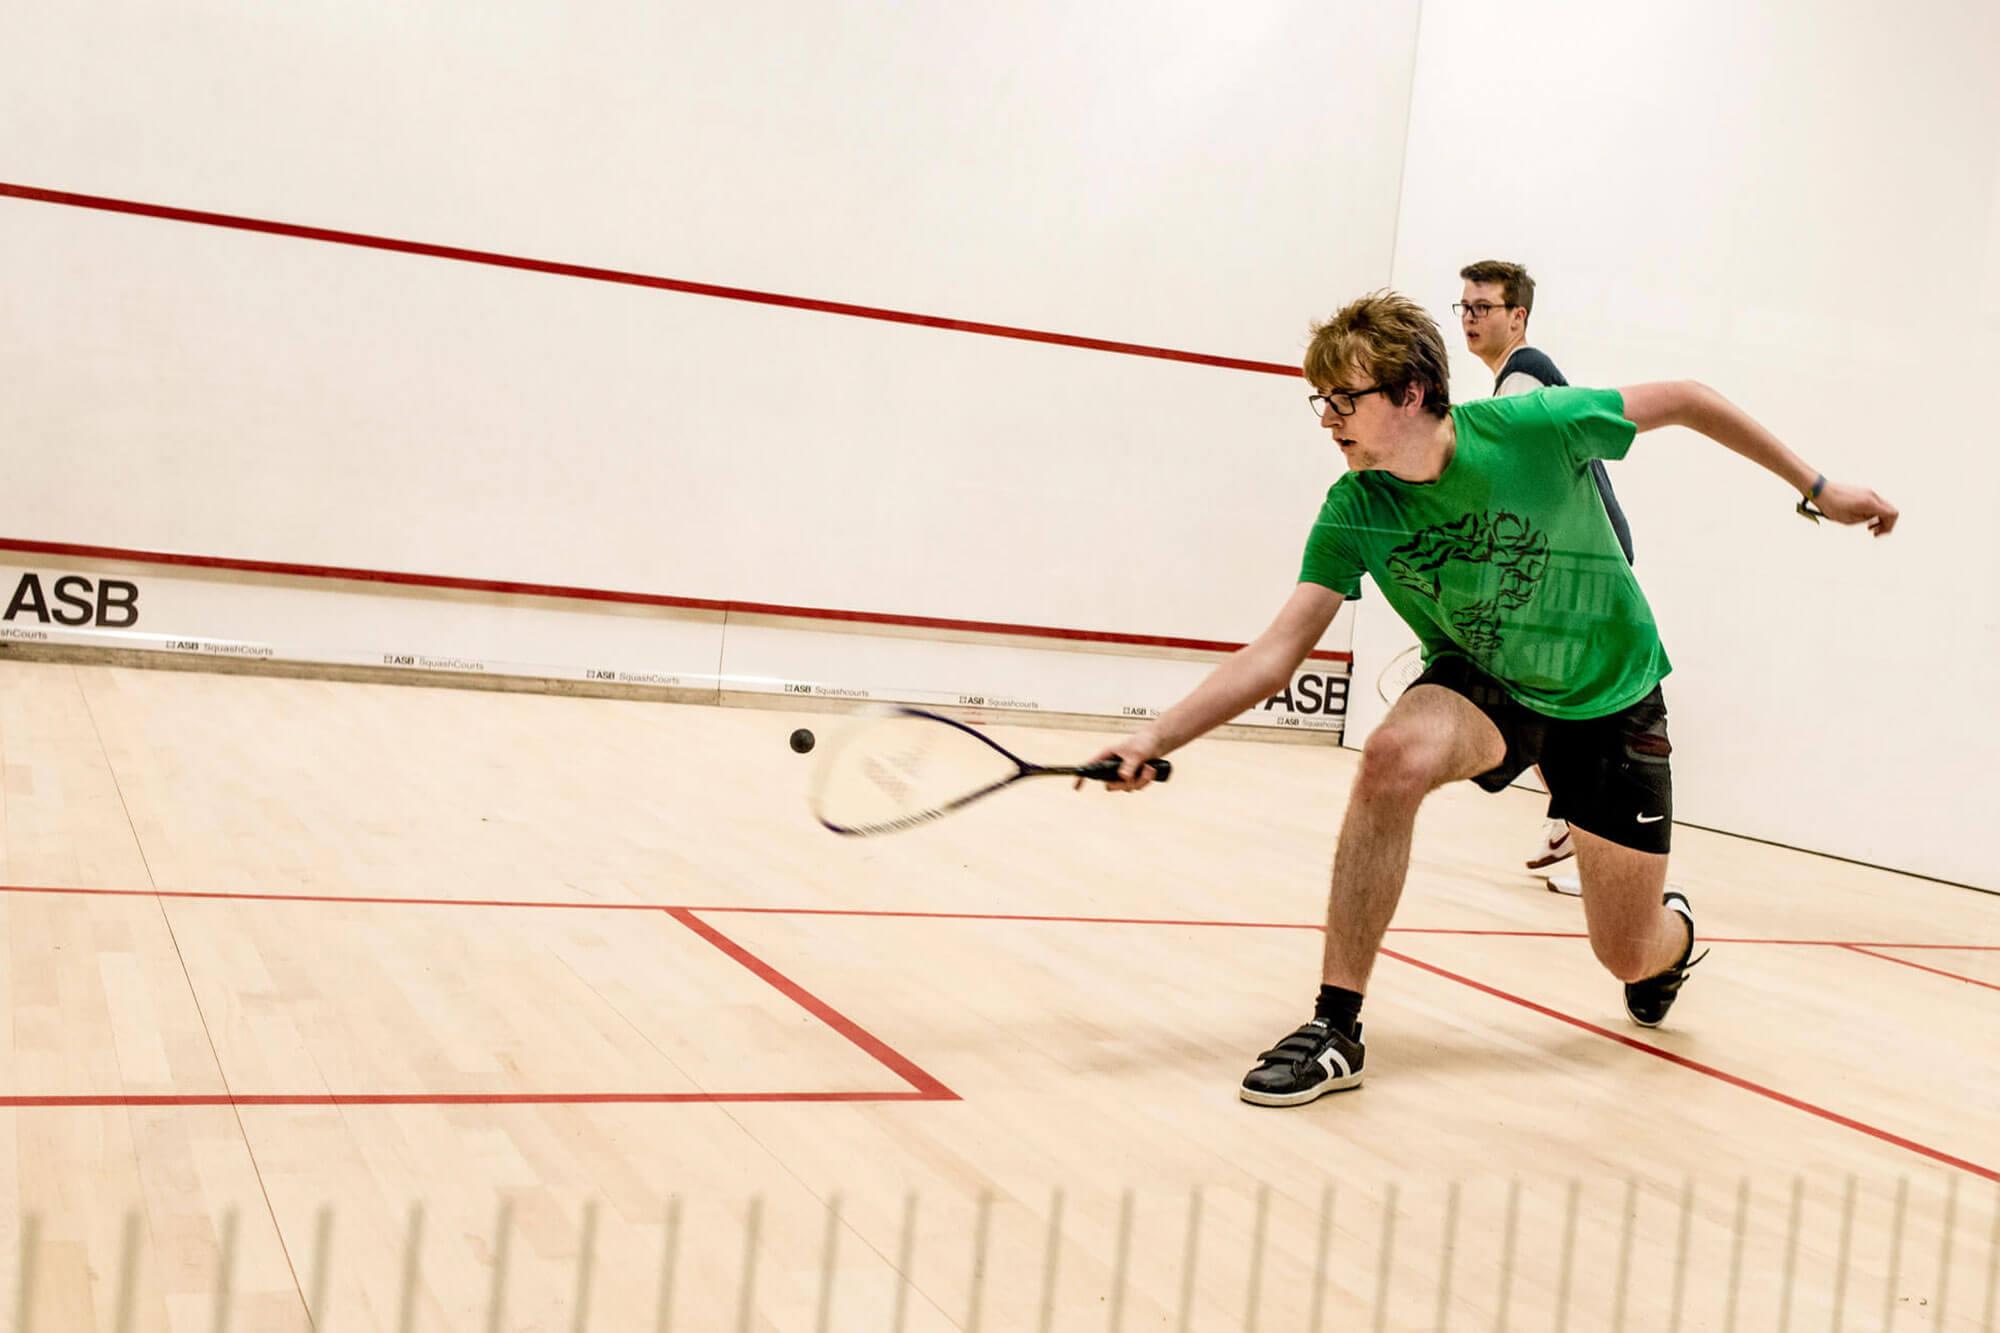 Social sport squash